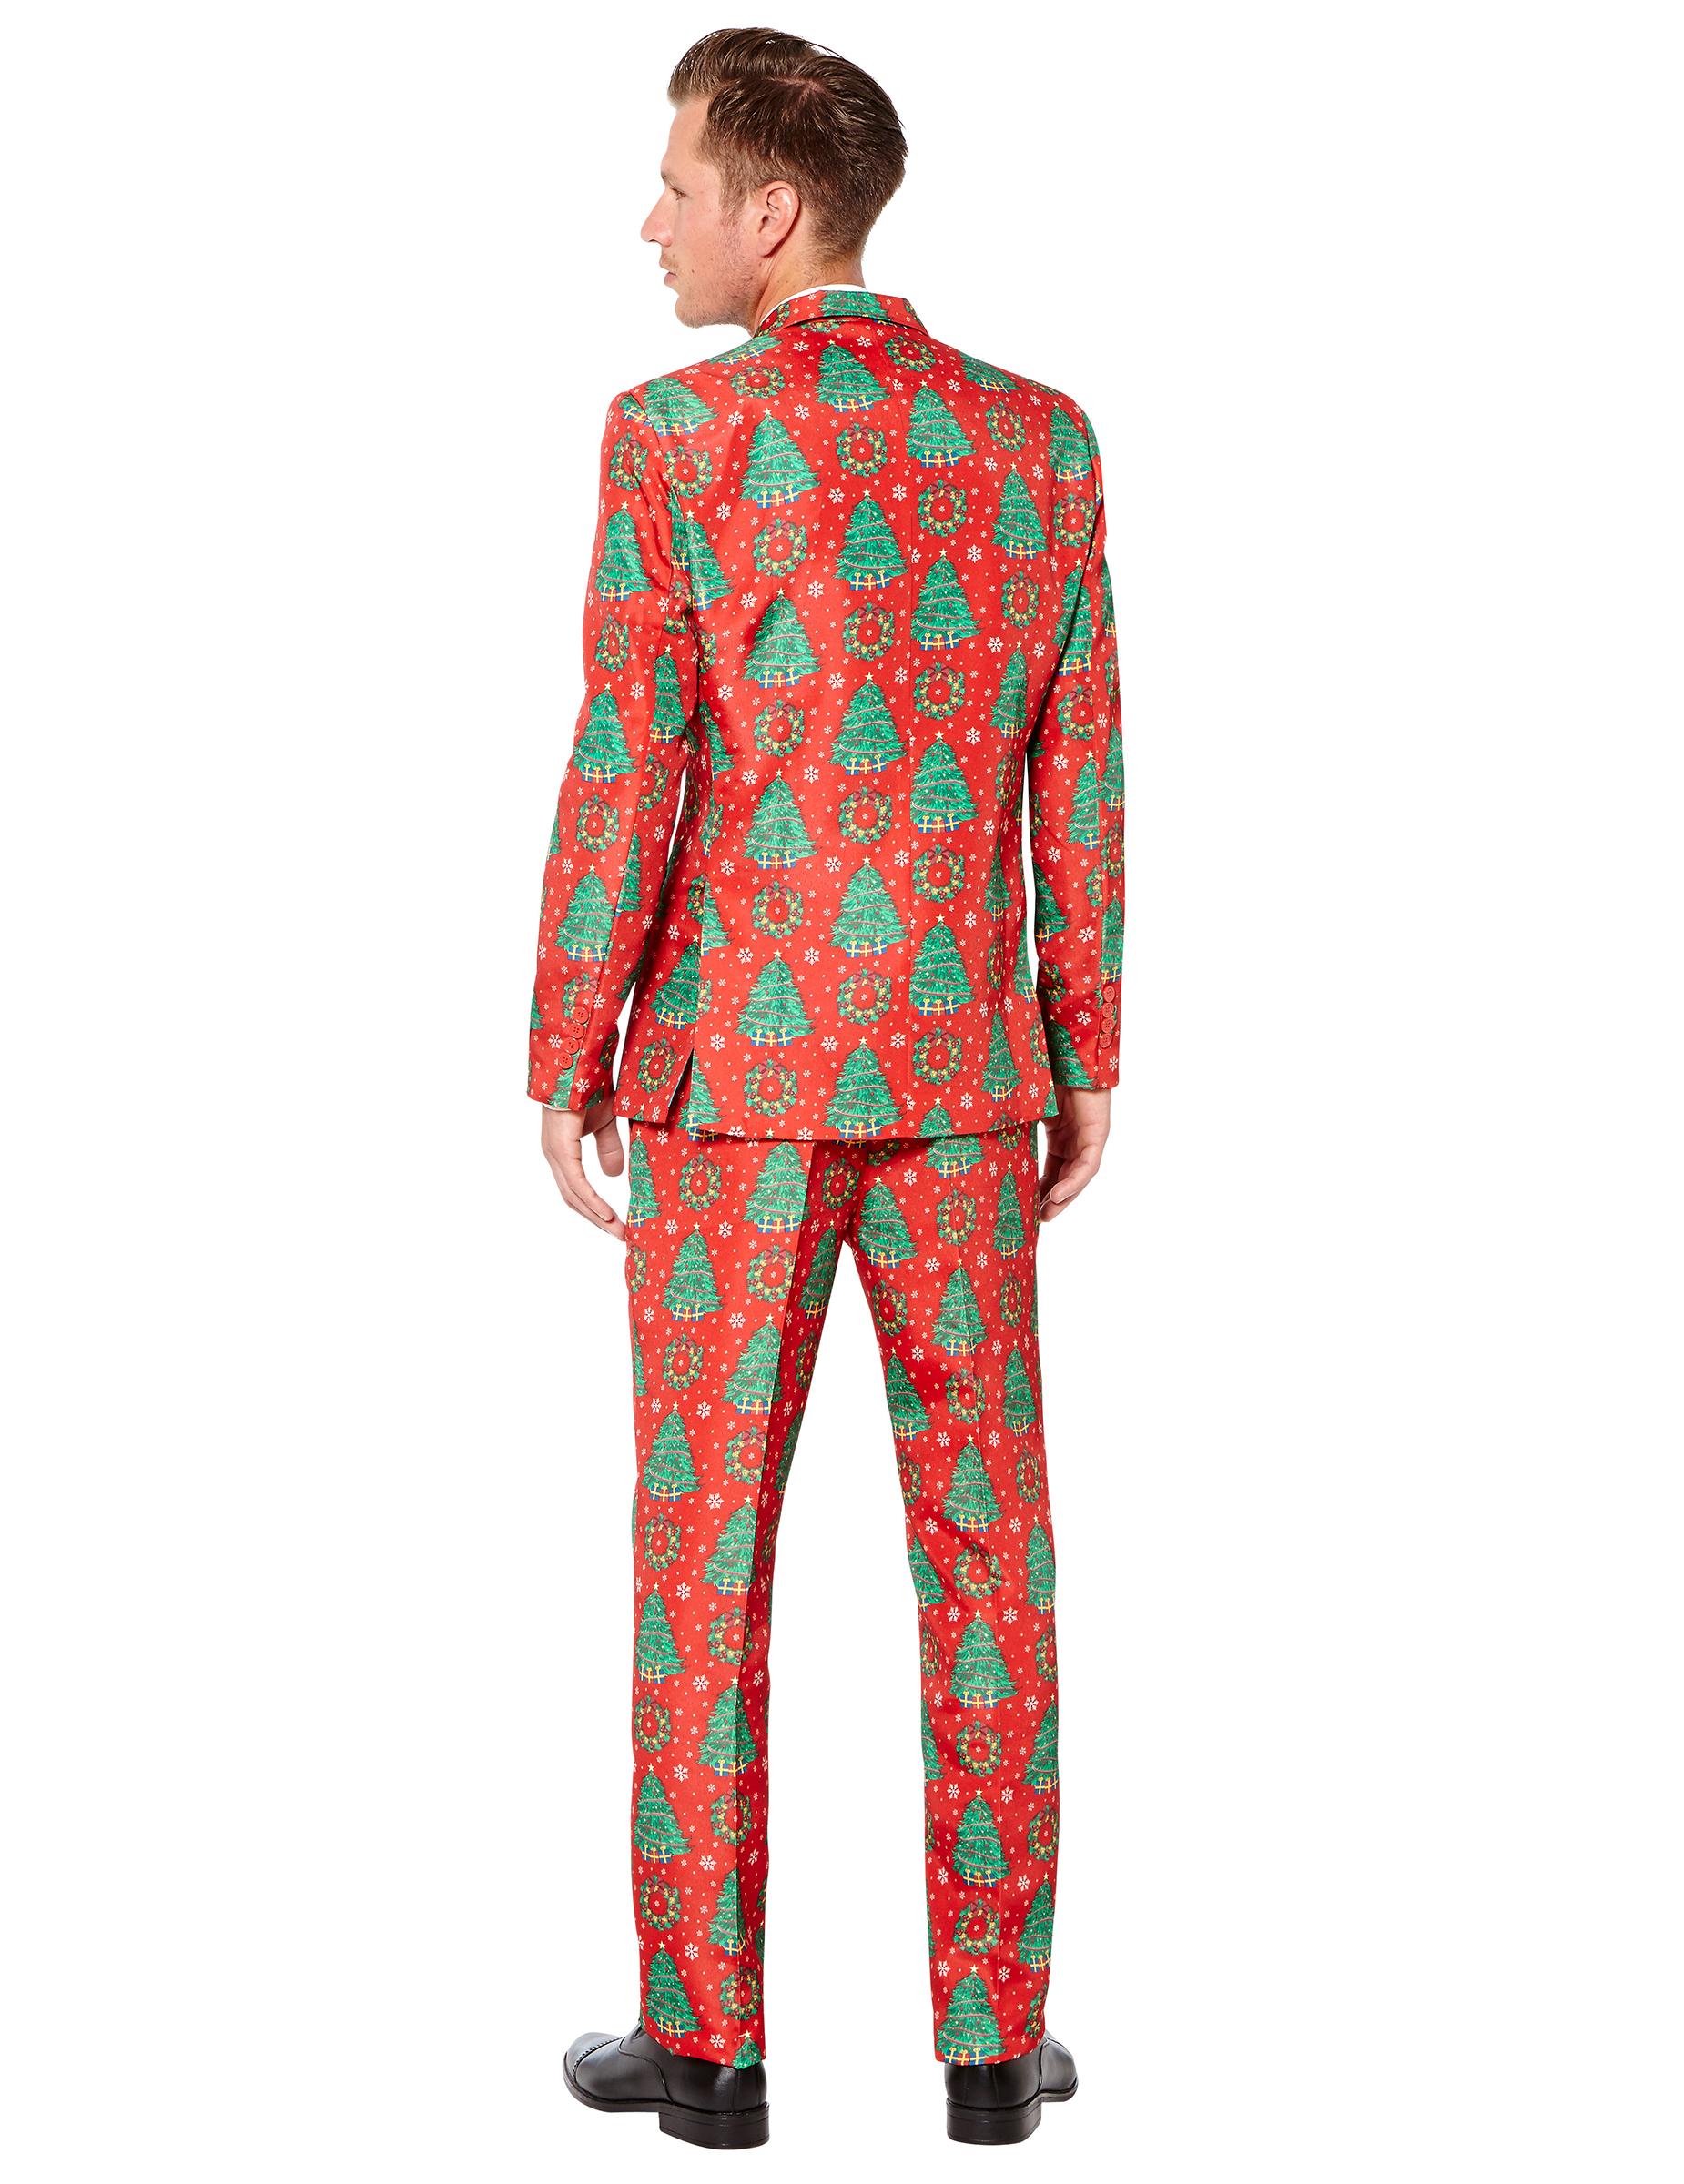 costume mr sapin rouge homme suitmeister no l deguise toi achat de d guisements adultes. Black Bedroom Furniture Sets. Home Design Ideas